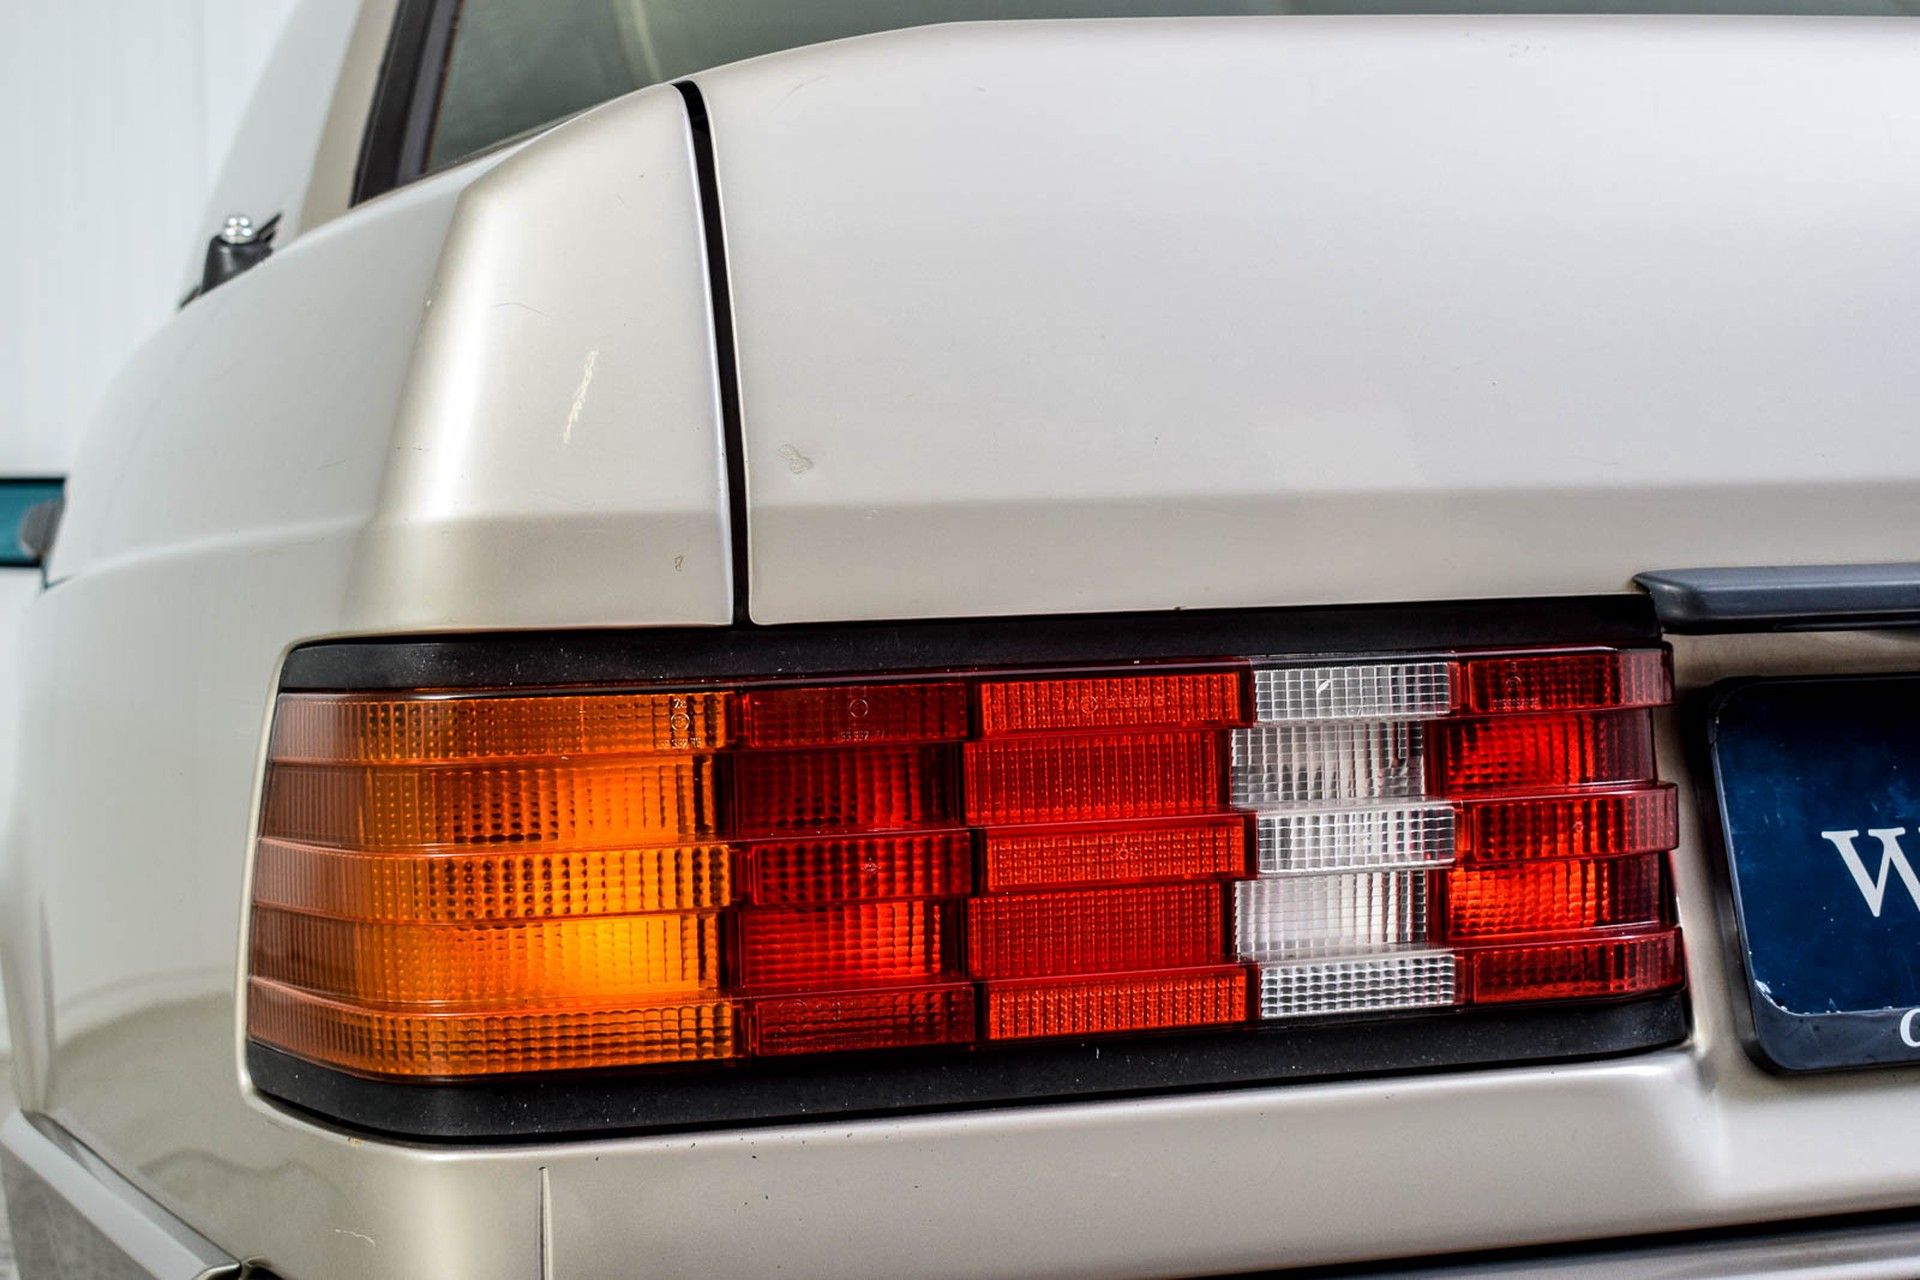 Mercedes-Benz 190 2.5 D Turbo Diesel Foto 38